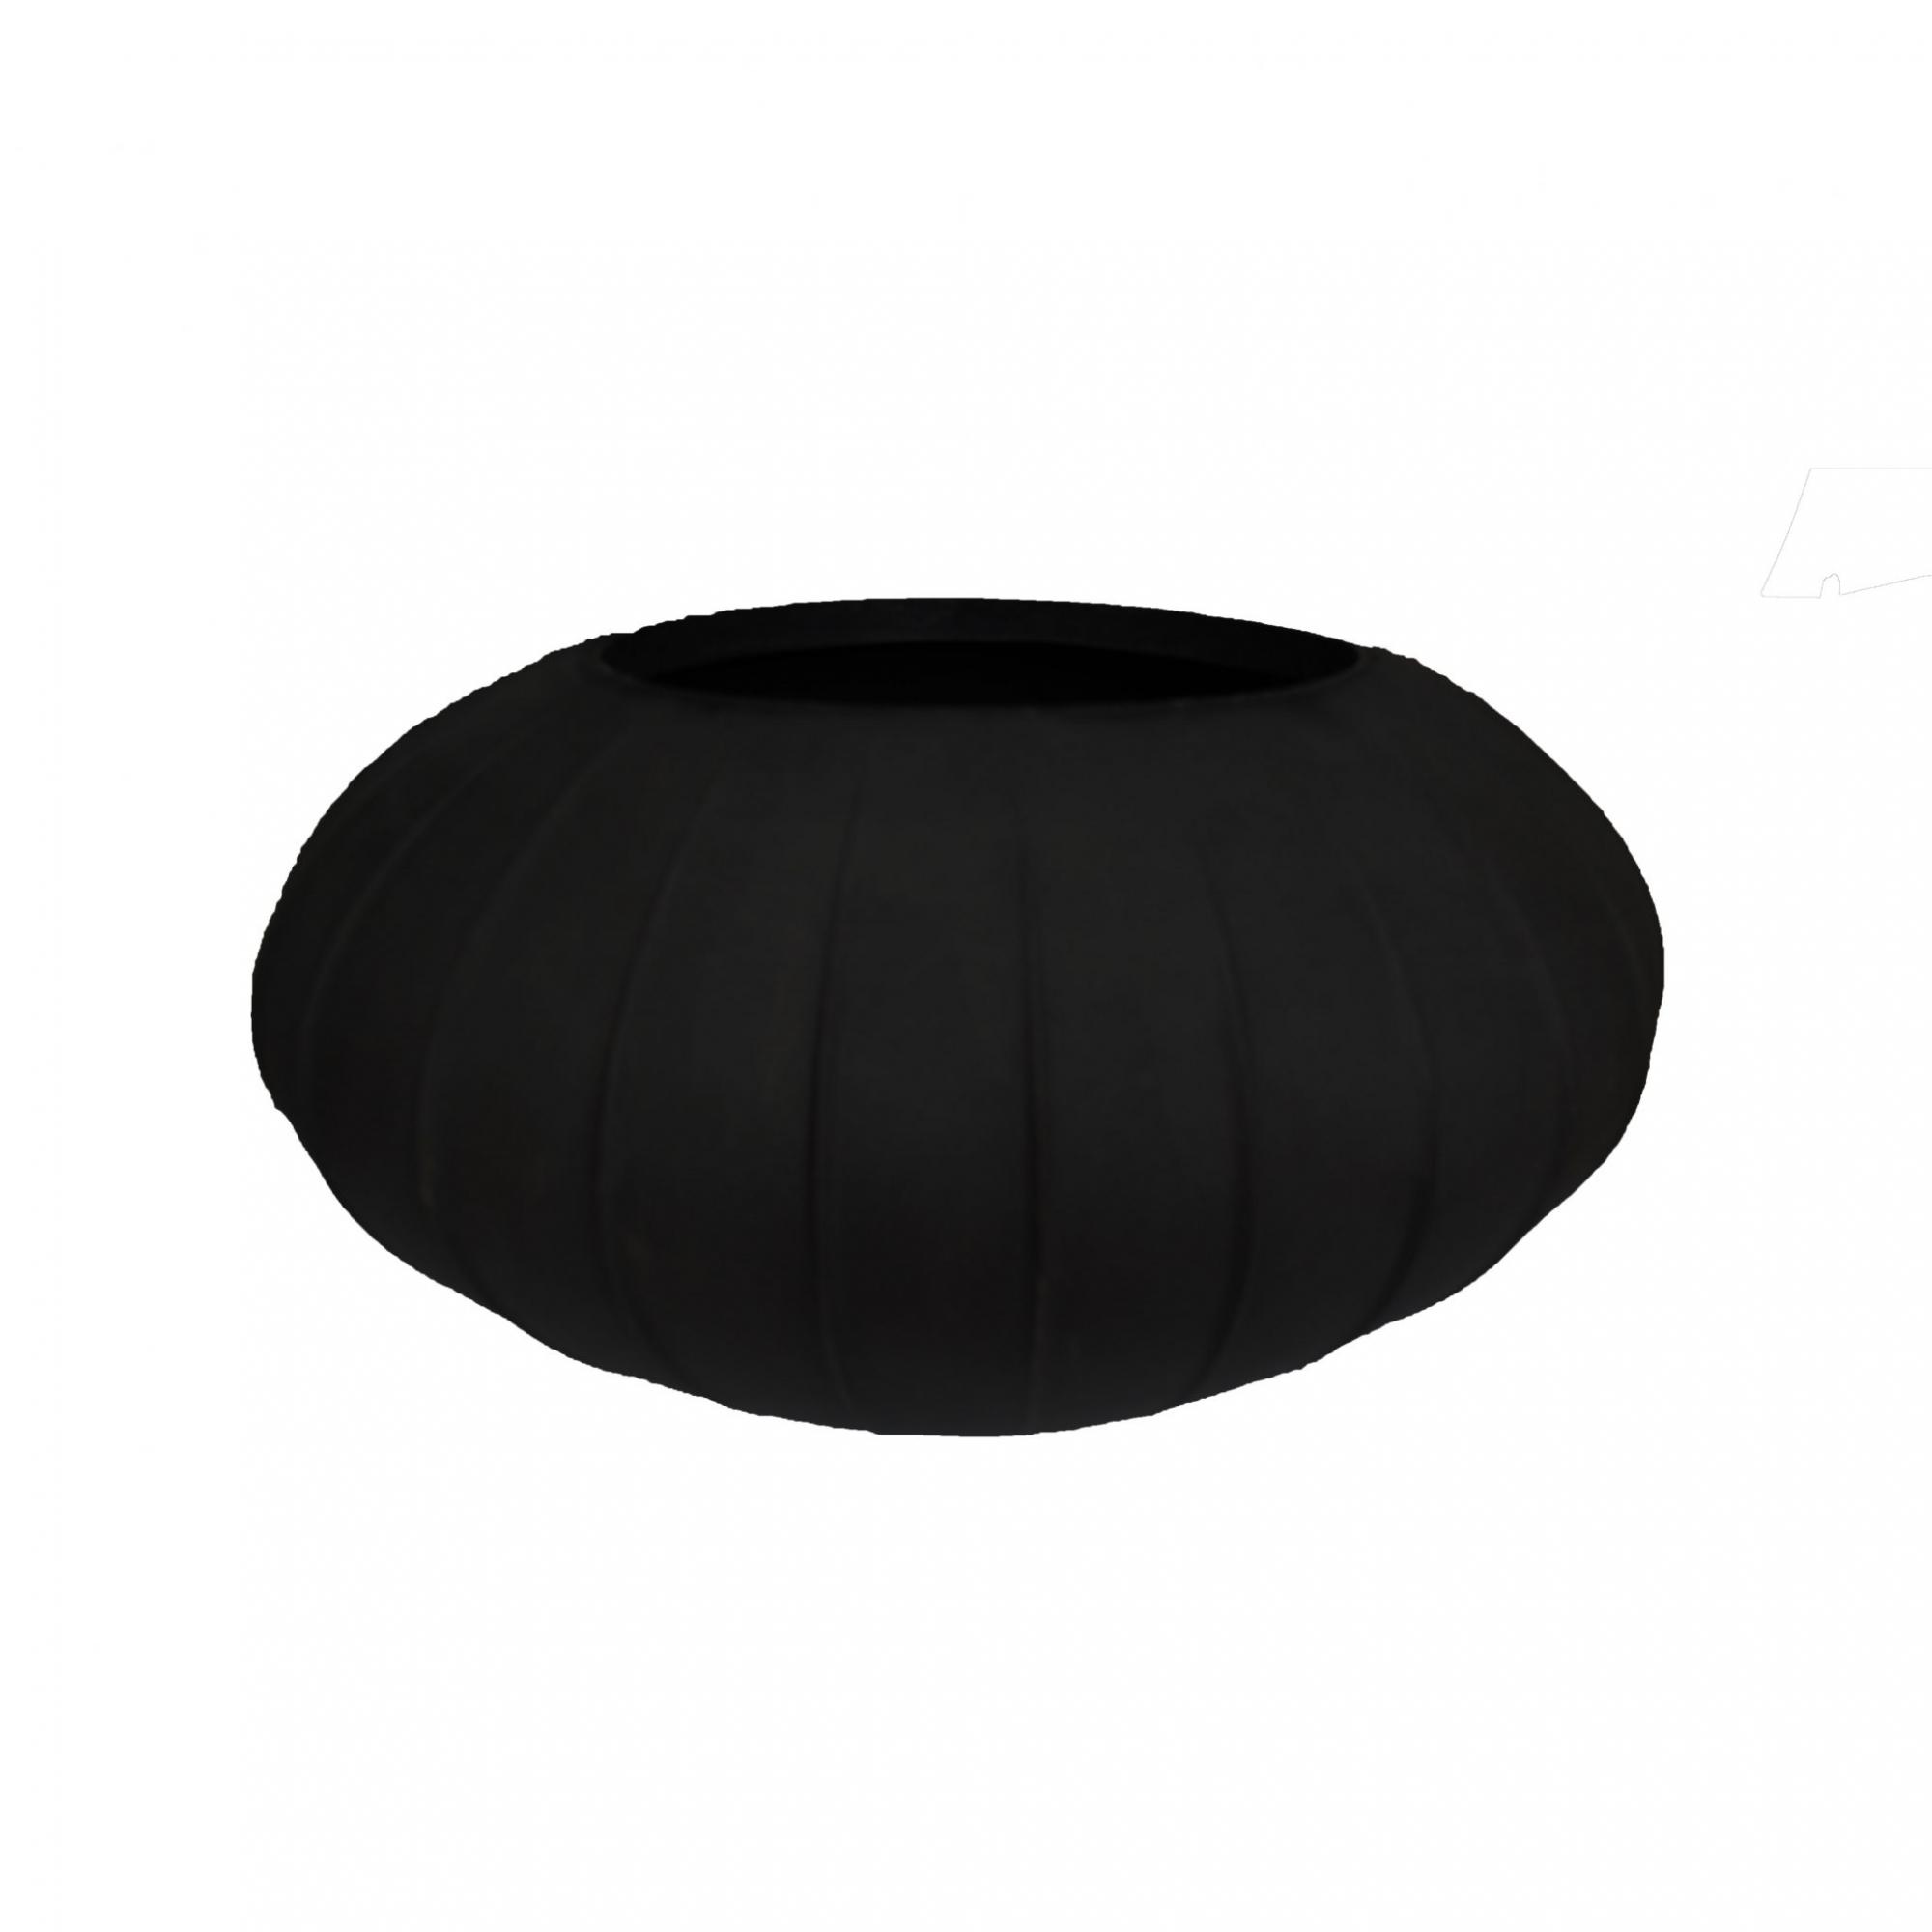 Vaso de Polietileno Oval 18cm Preto Fosco -  Coleção Hanazaki